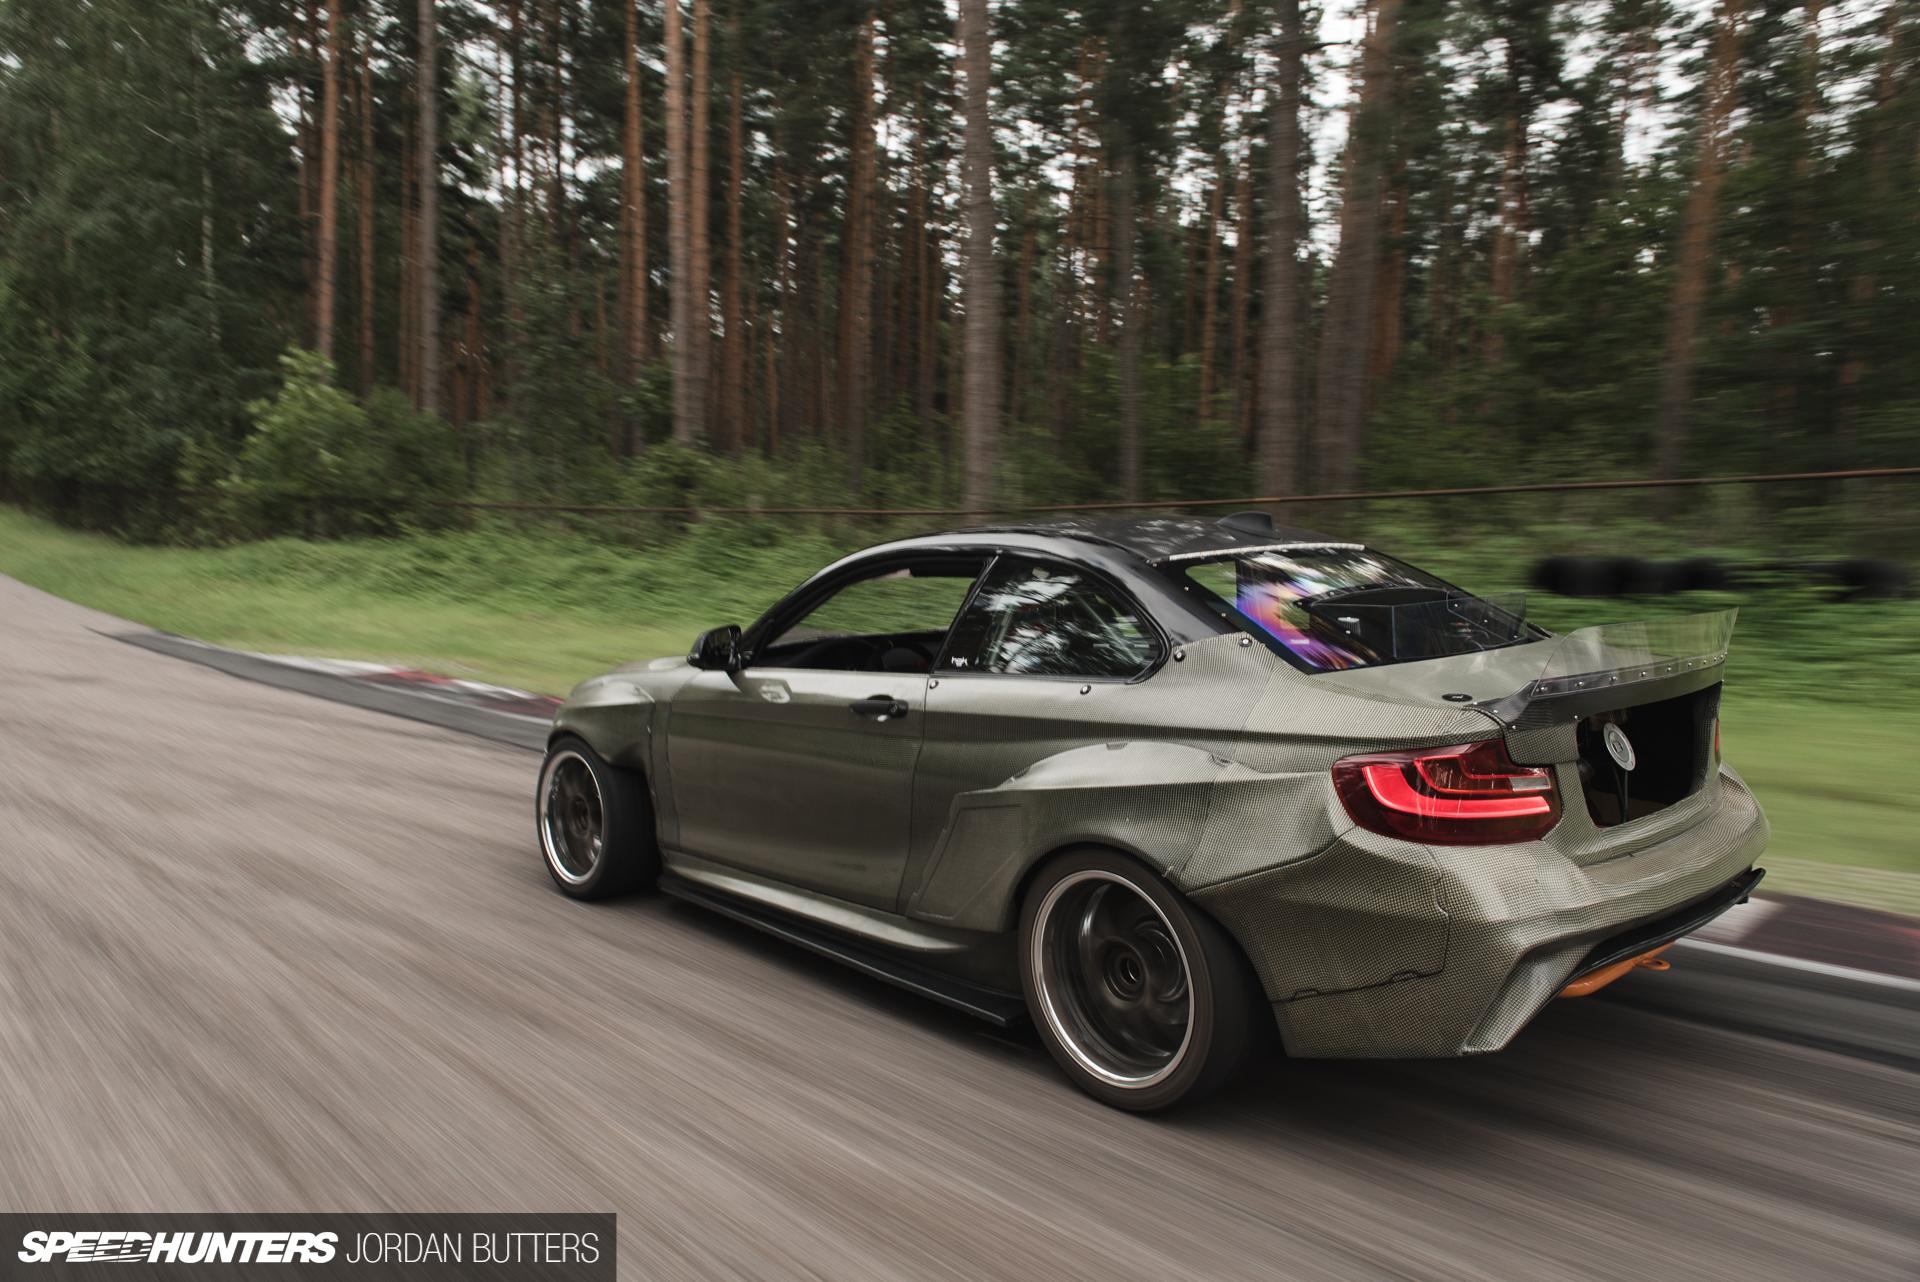 The Best Built Drift Cars In The World